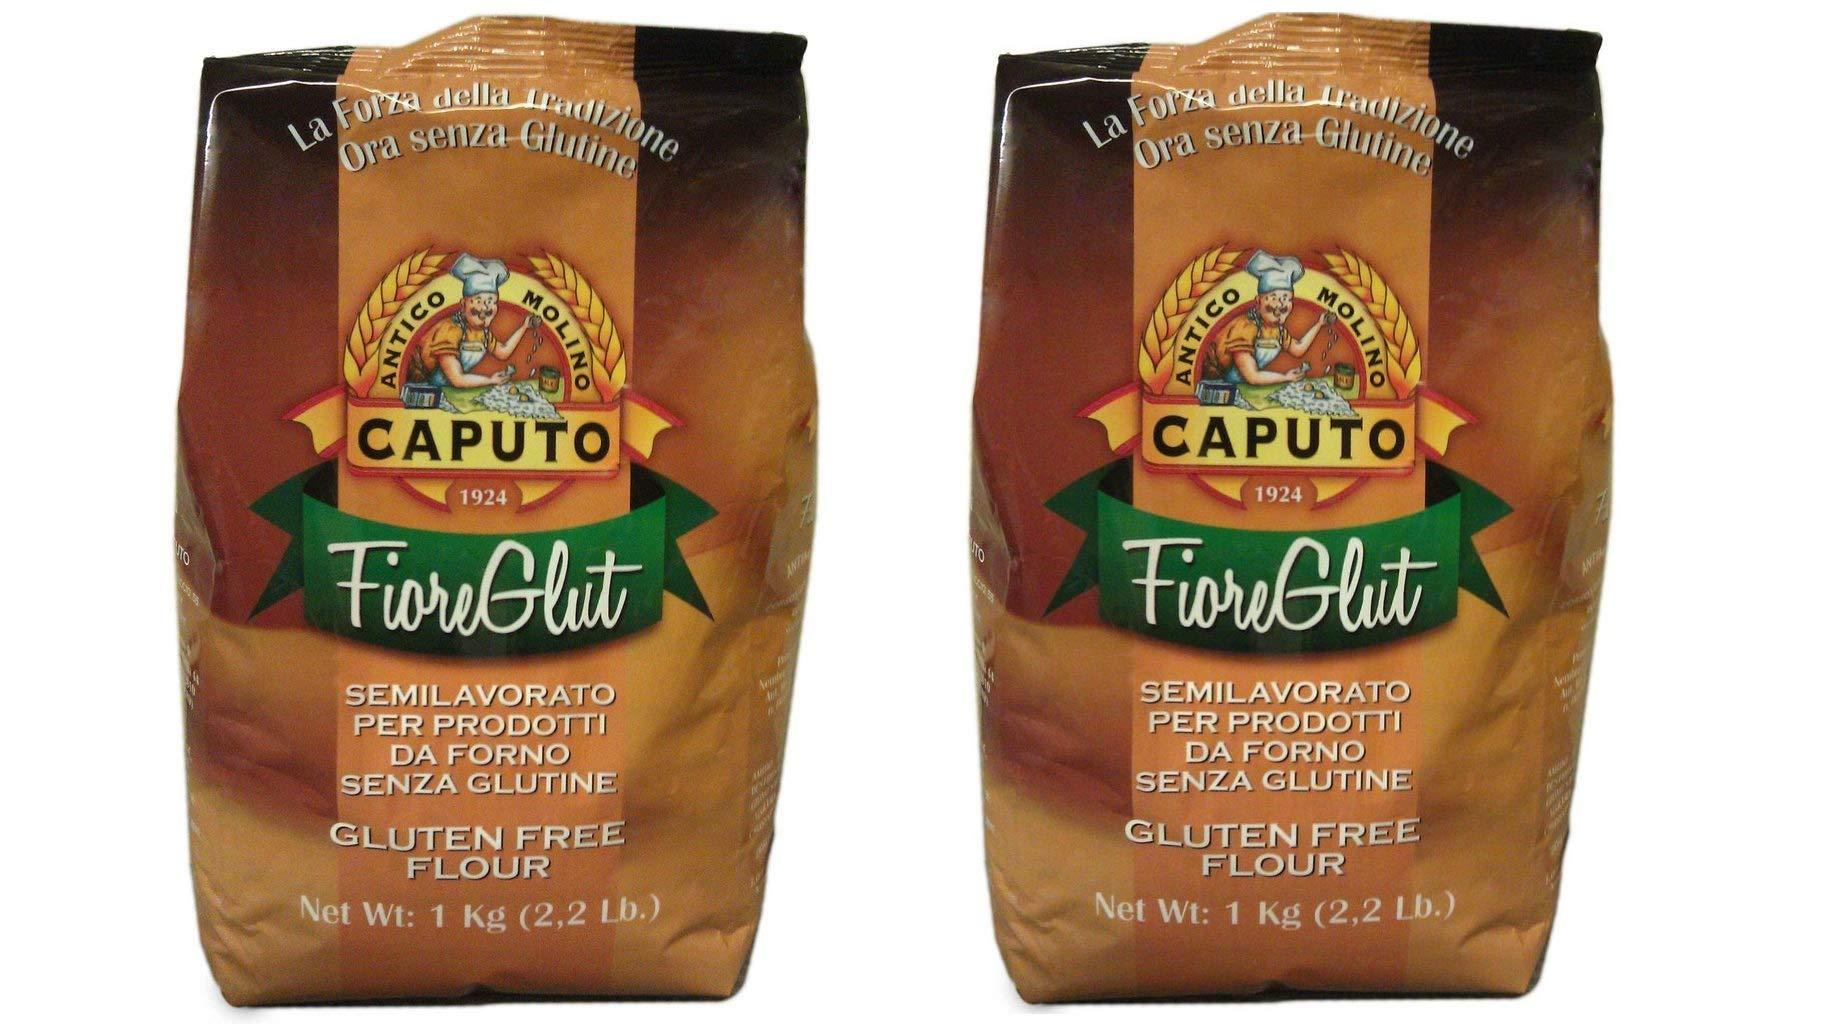 Antico Molino Napoli Antimo Caputo Pizza Flour, Gluten Free, 2 Pound (Pack of 2) by Antico Molino Napoli